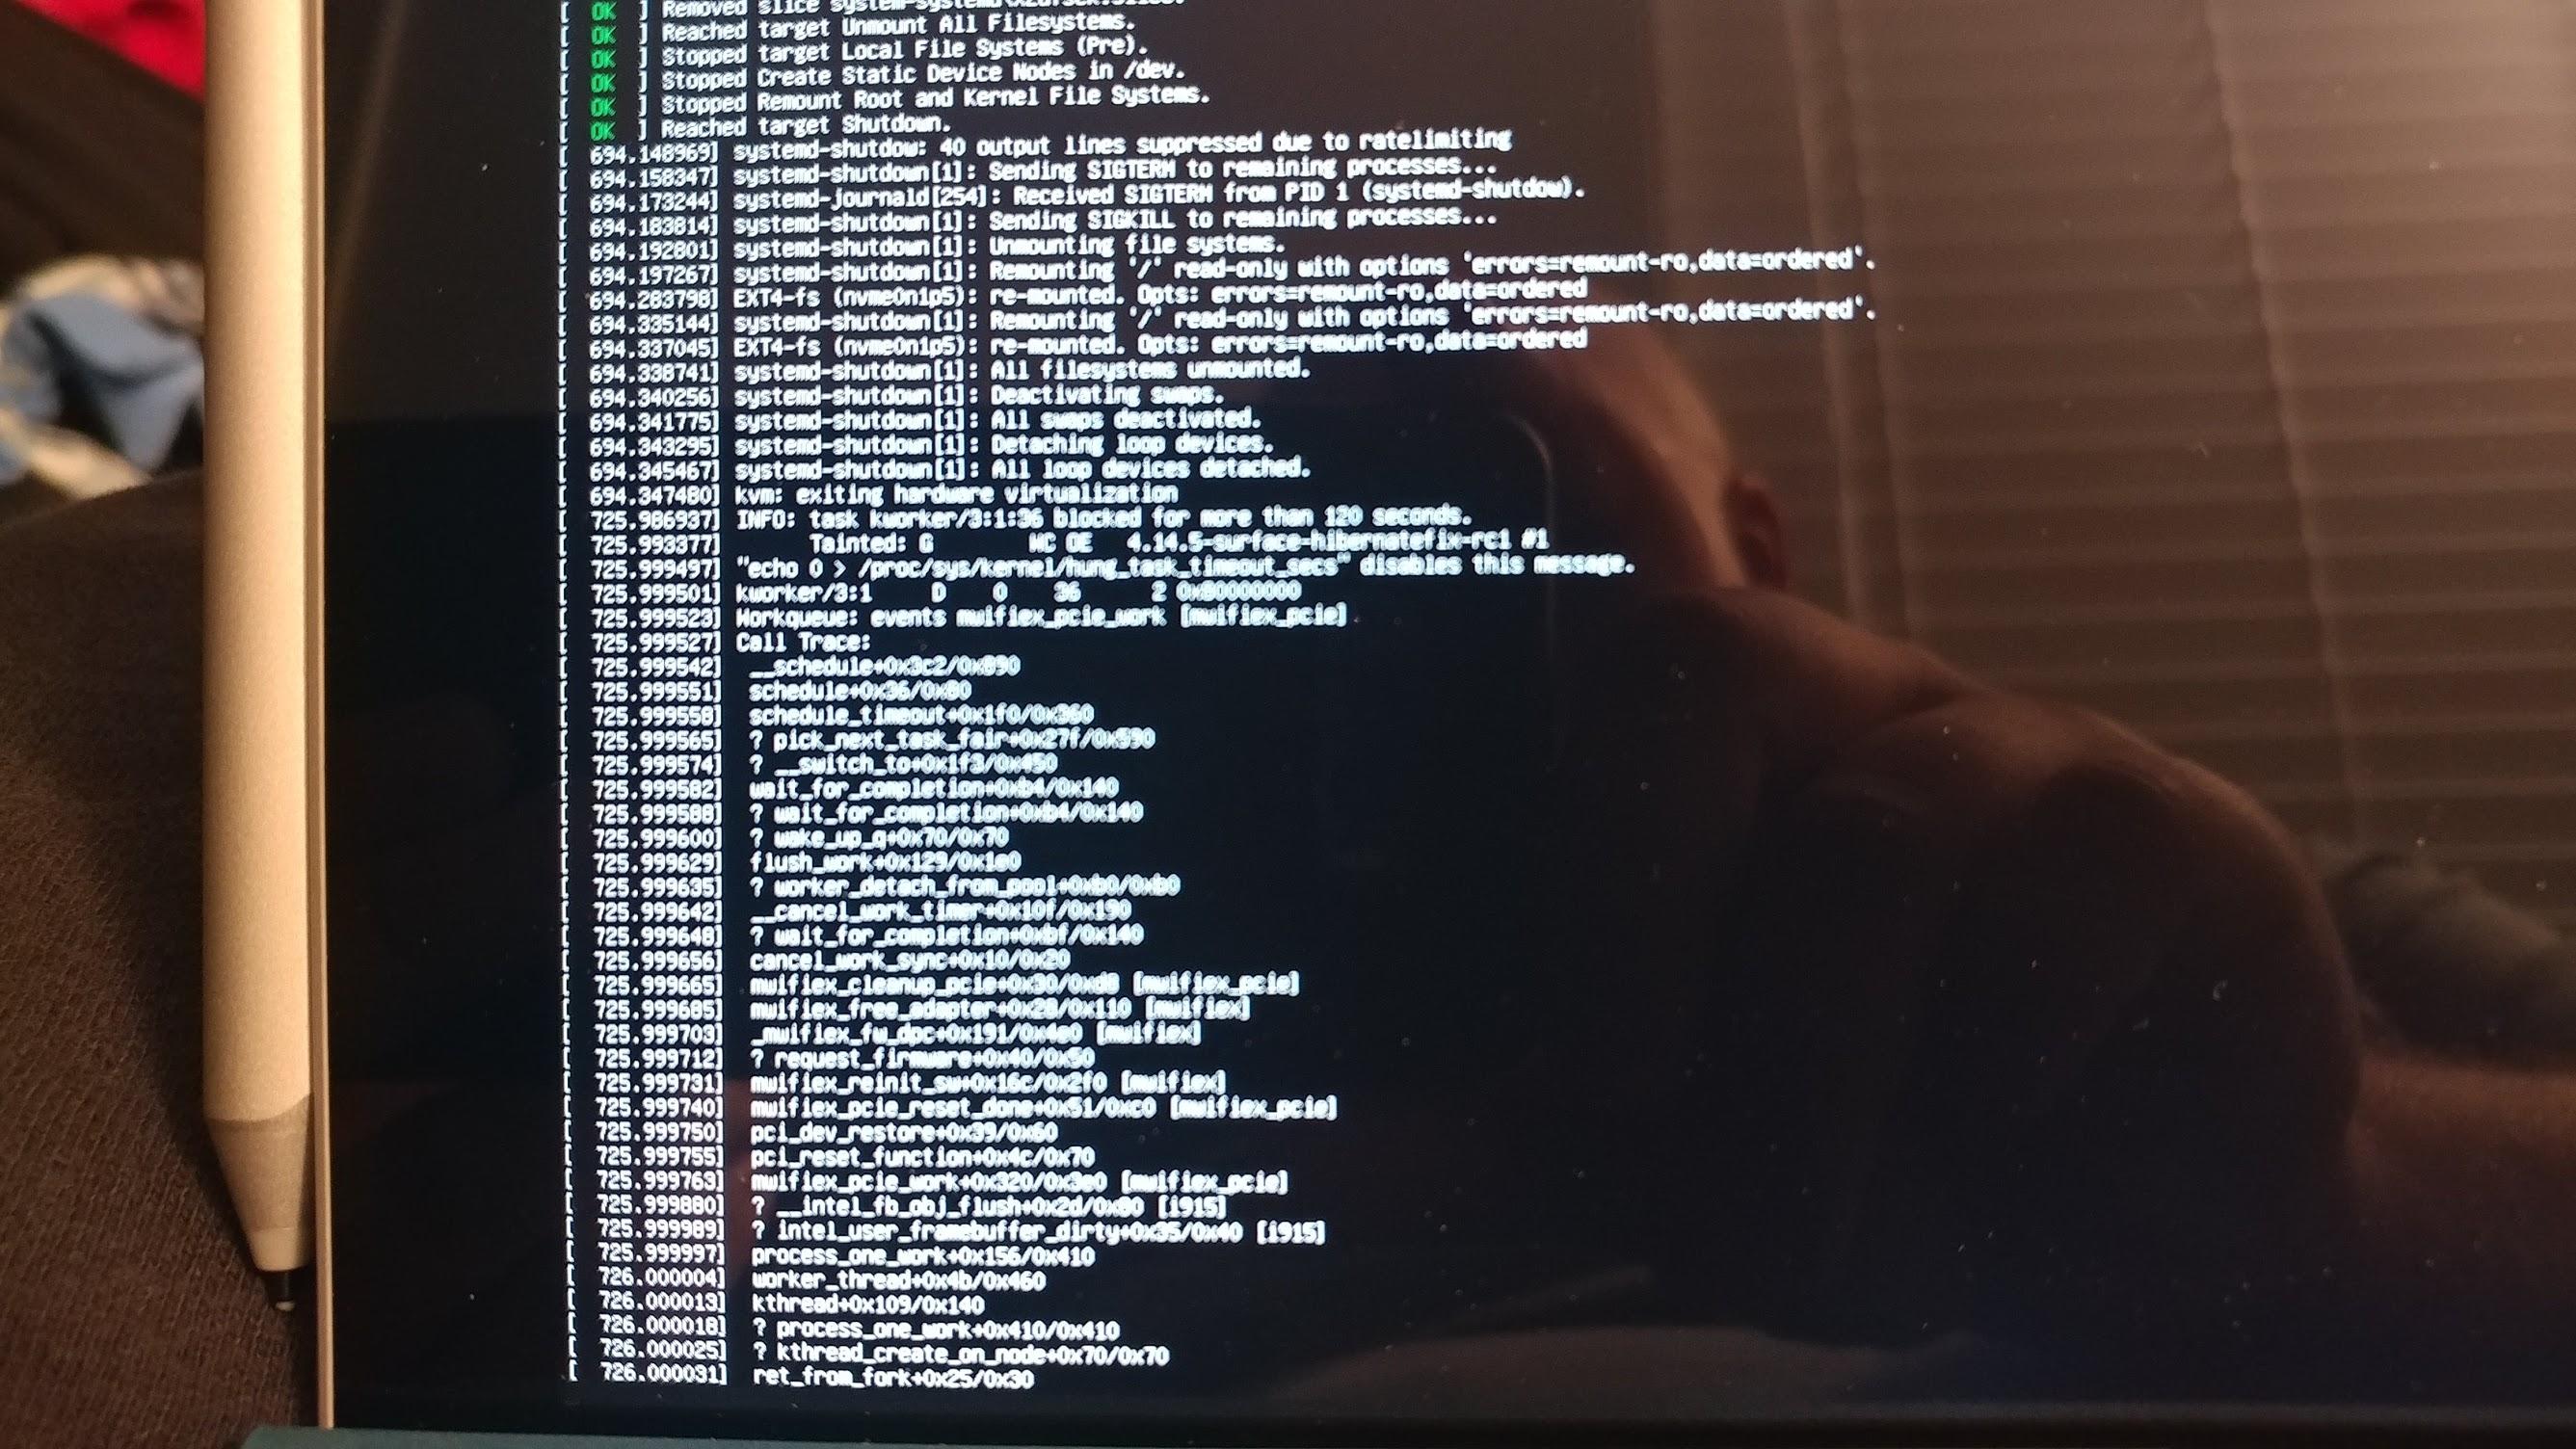 Surface Pro 4: Hibernation is broken on kernel 4 14 3 - 4 18